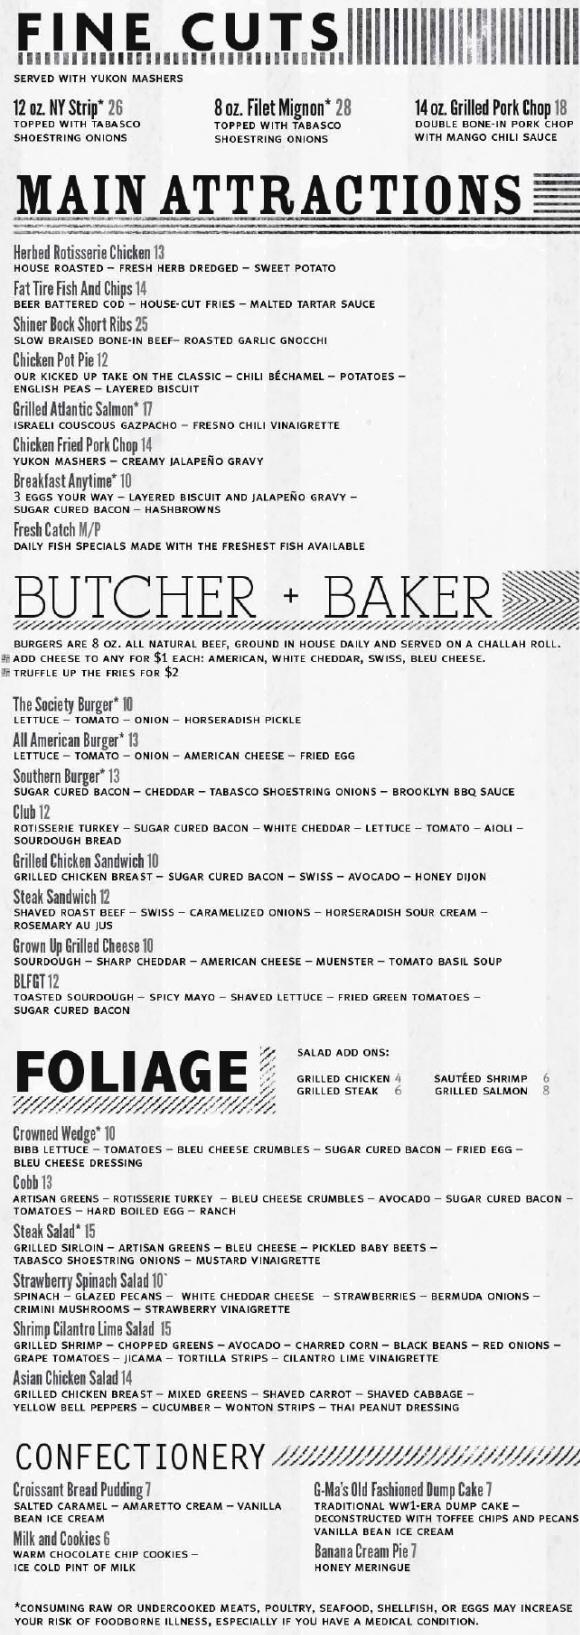 league-menu2